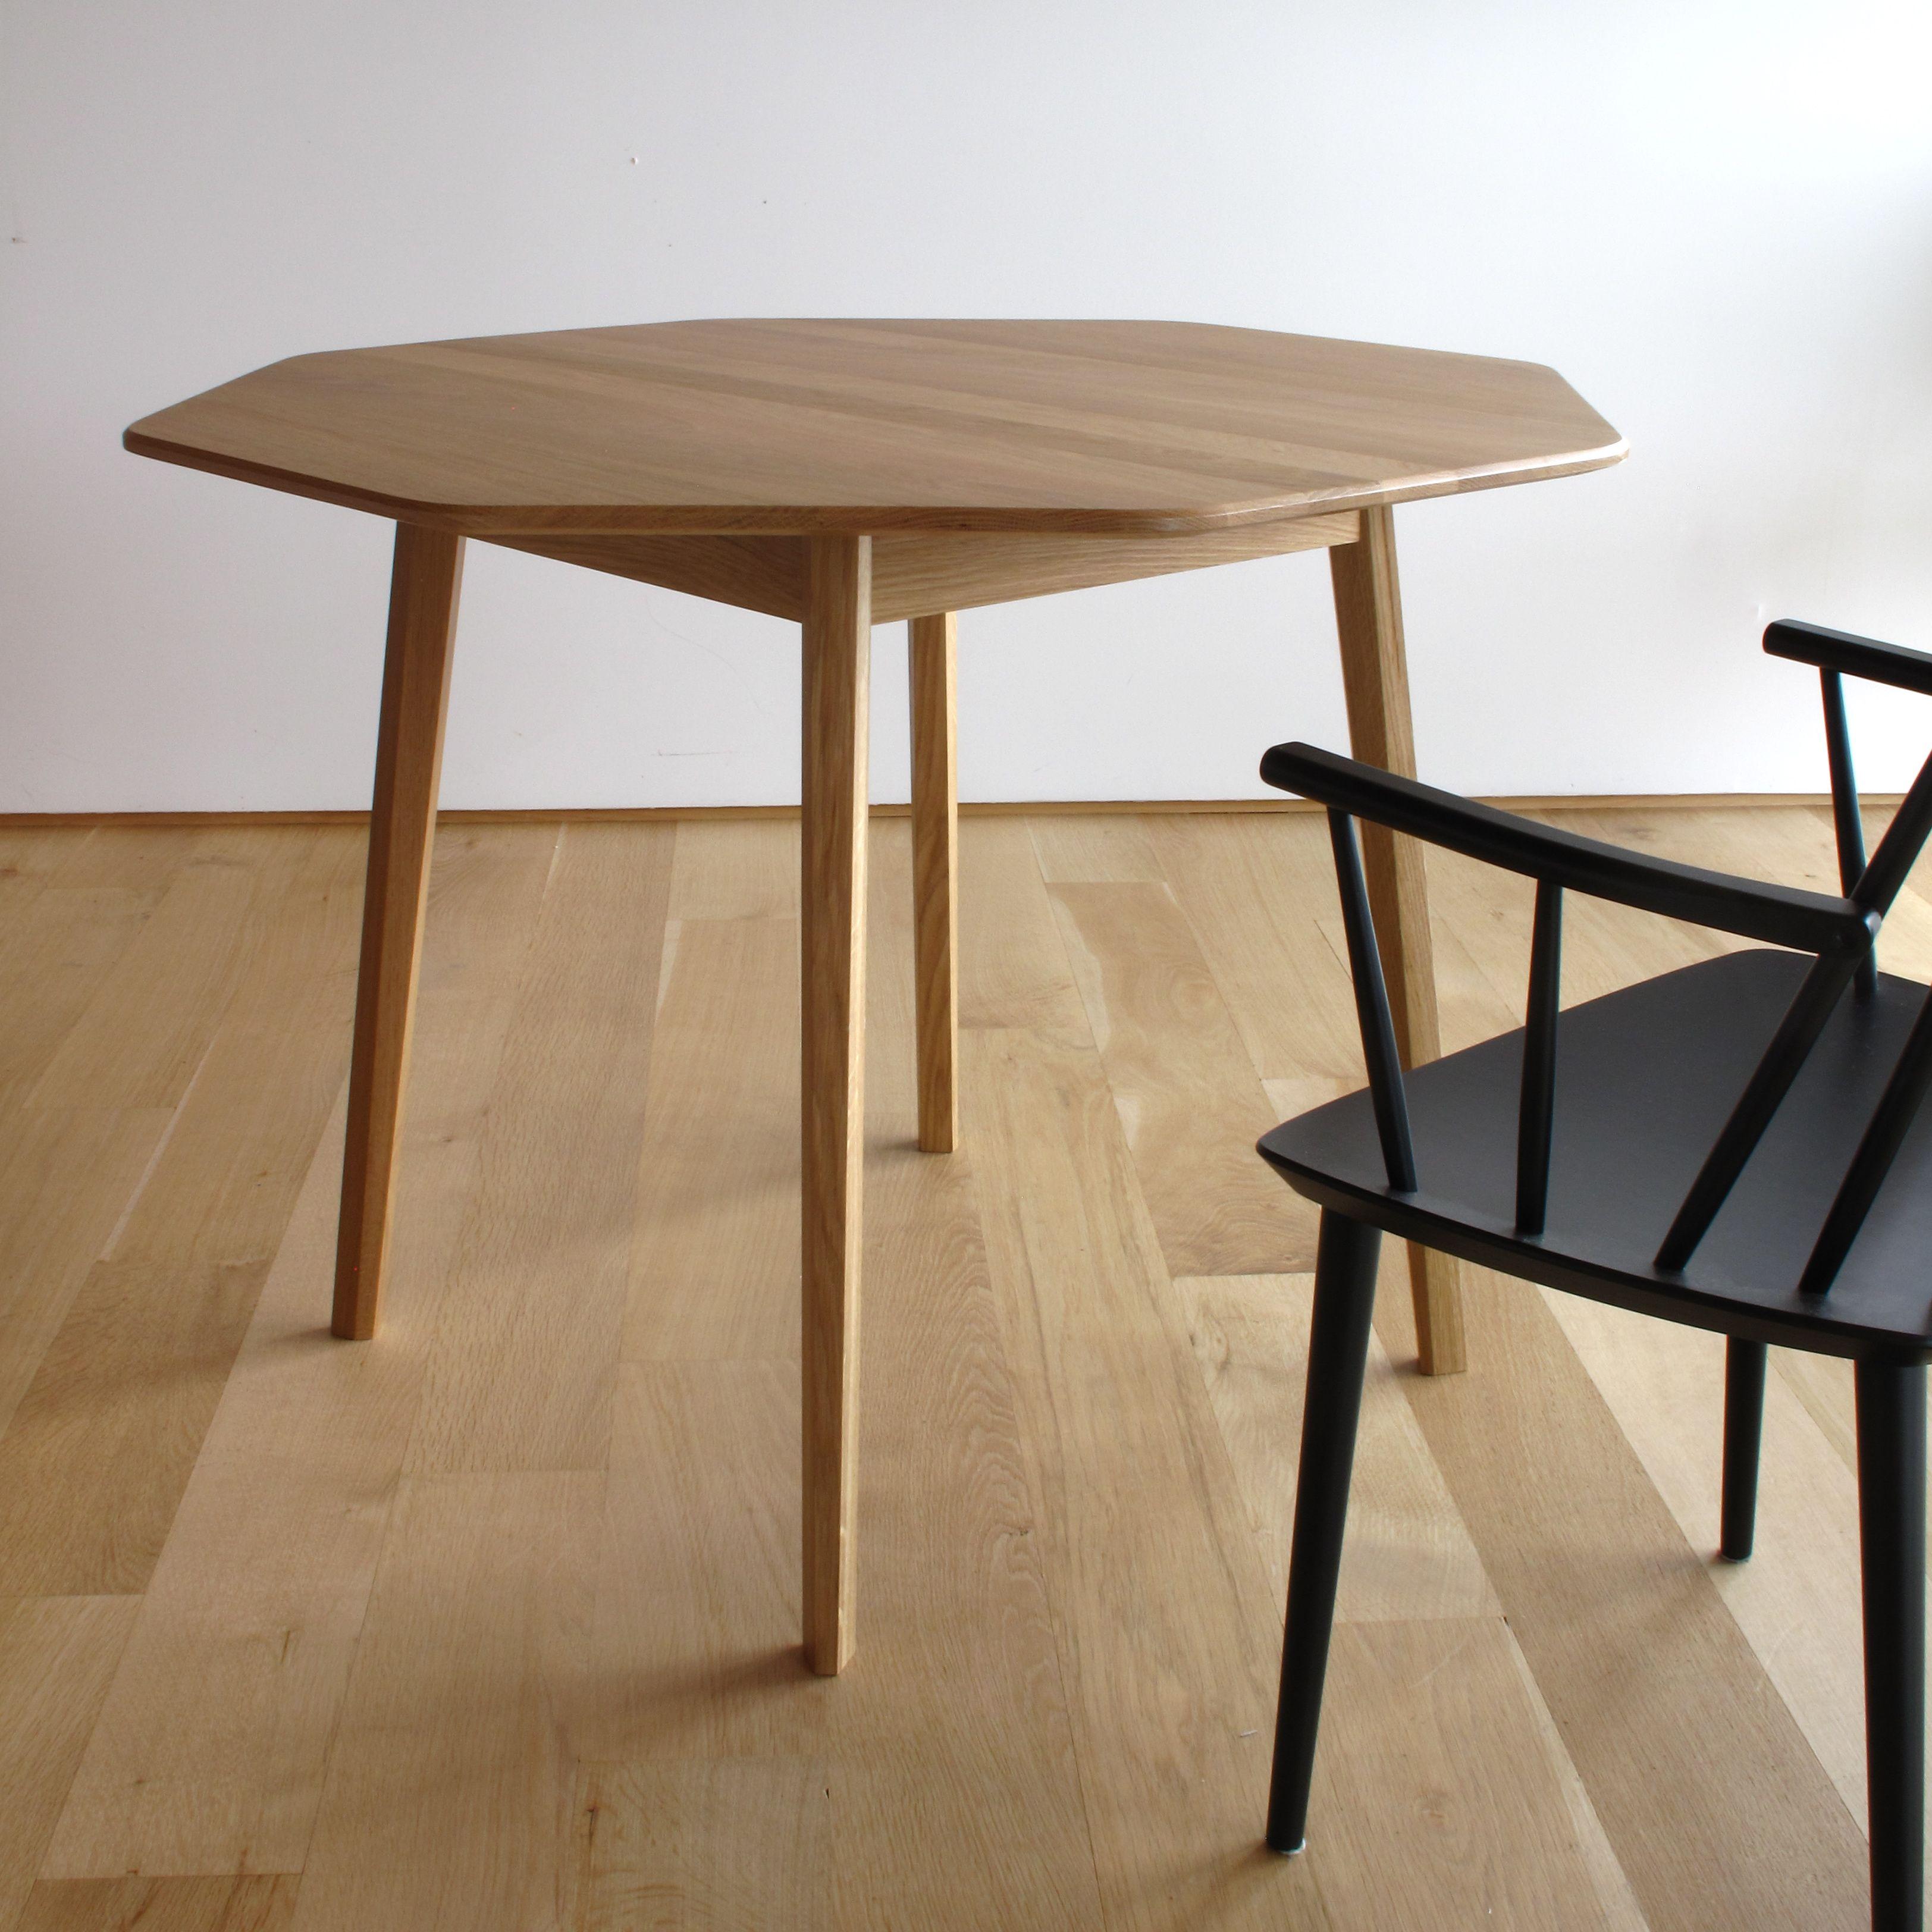 Verso Octogonal Table Oak Design By Atelier Noah For Coop Etabli Catalogue De Meubles Mobilier De Salon Chaise Salle A Manger